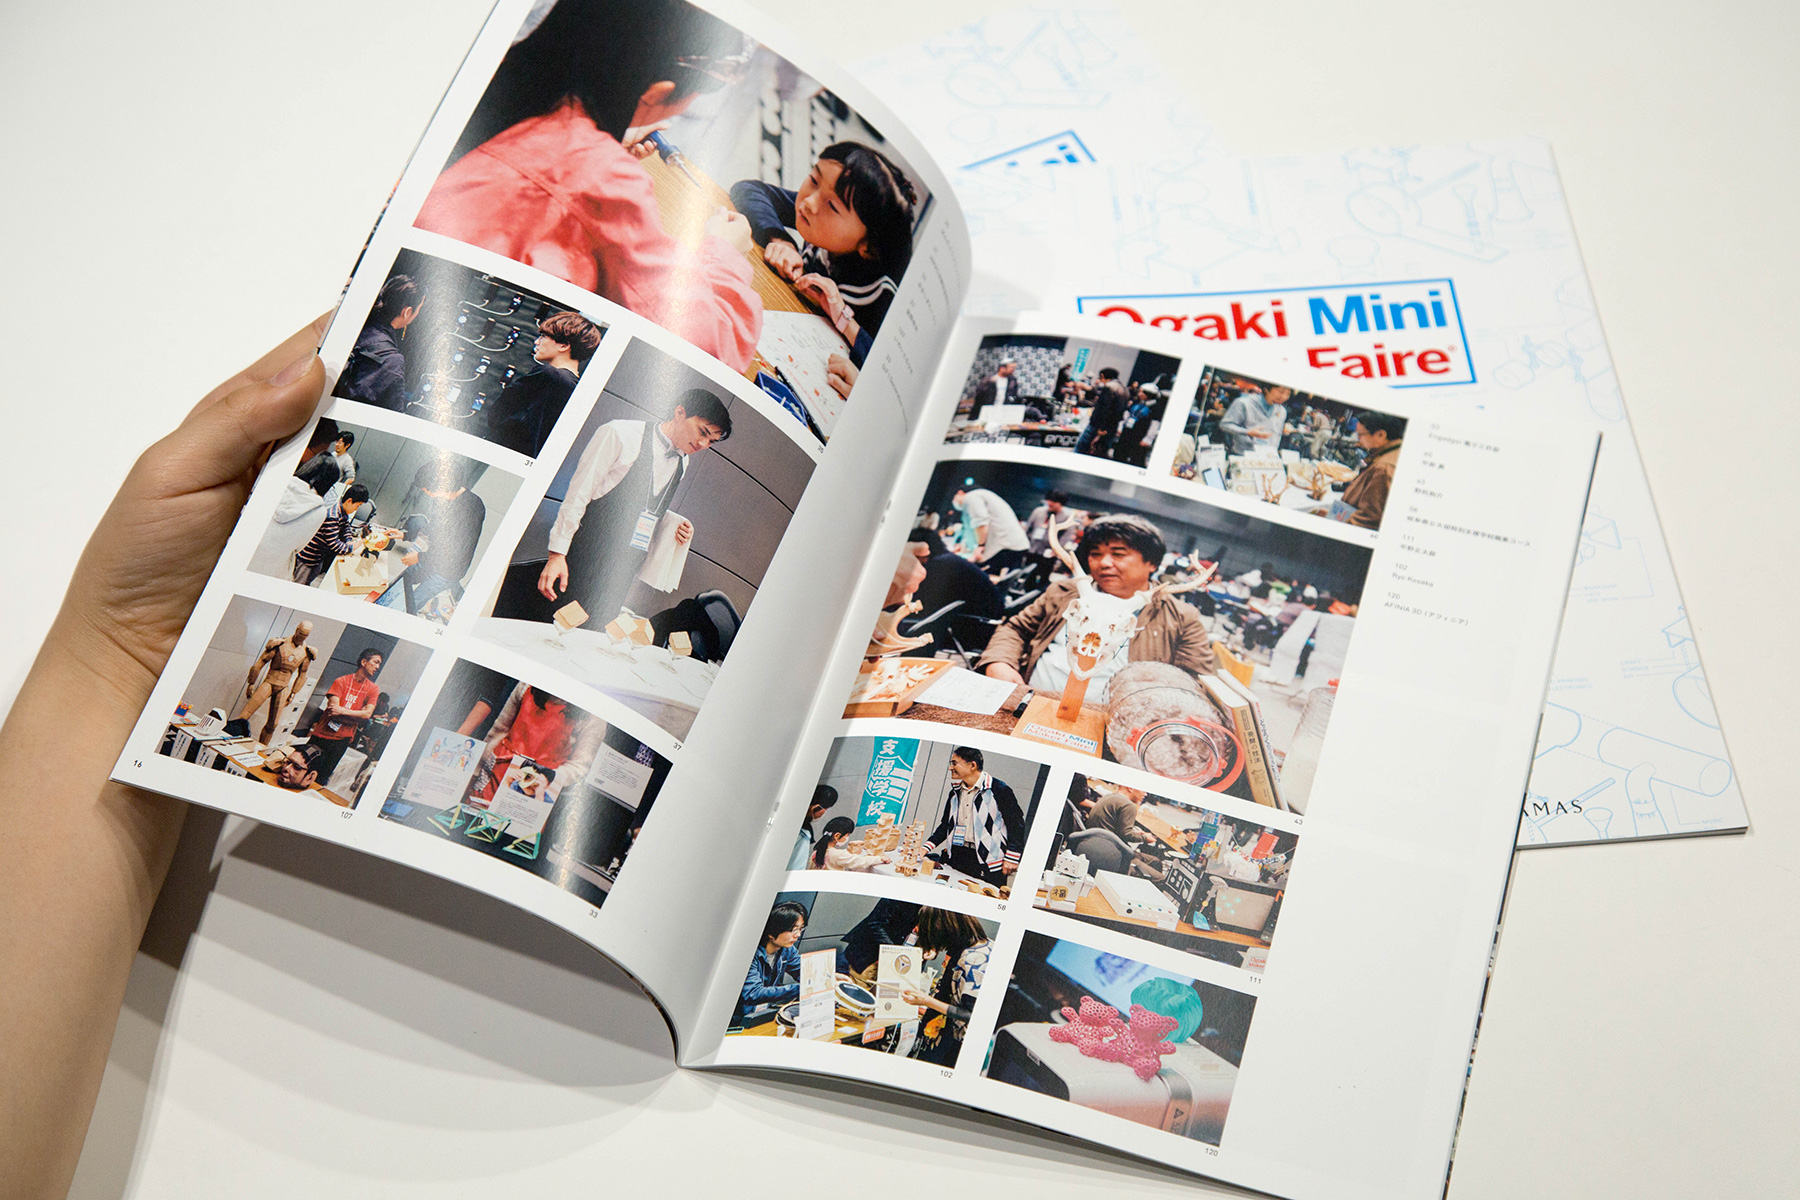 Ogaki Mini Maker Faire 2016イメージ